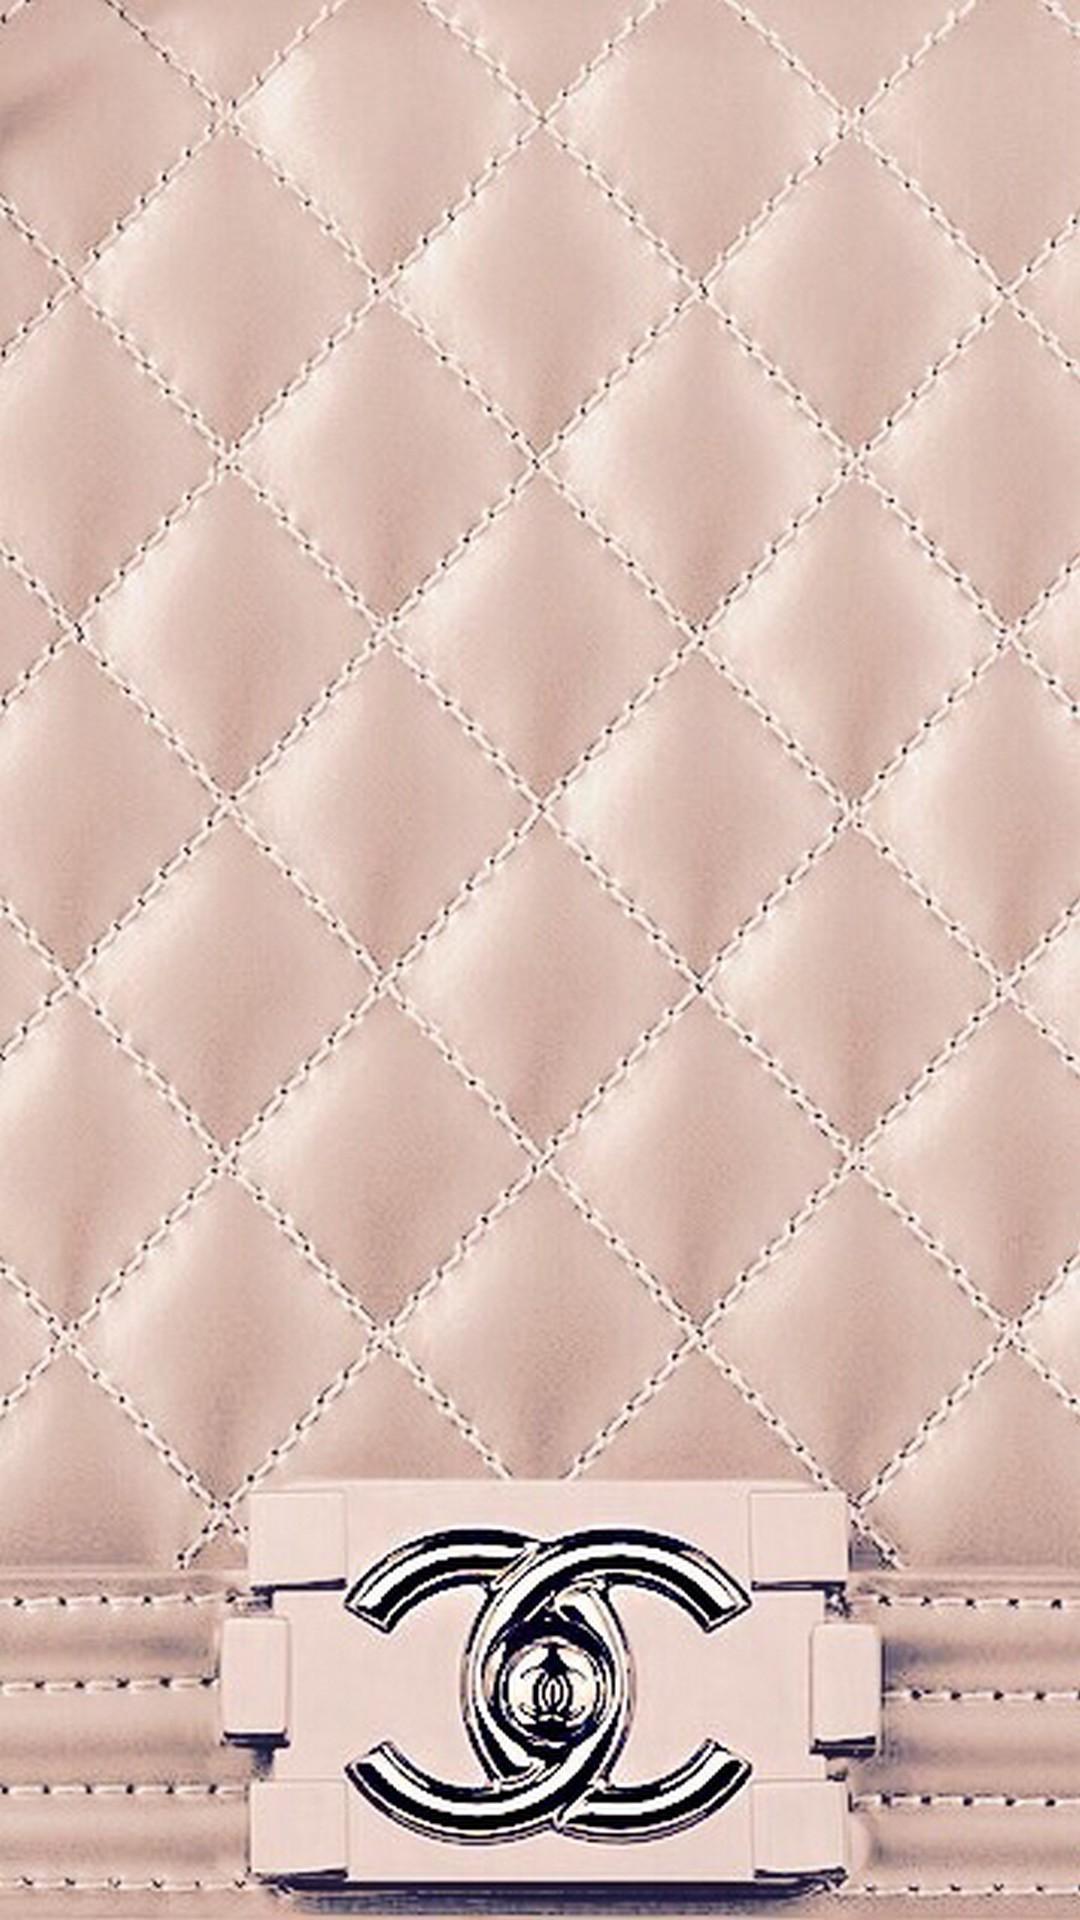 1080x1920, Iphone X Wallpaper Rose Gold Themen Mit - Rose Gold Wallpaper Iphone X - HD Wallpaper